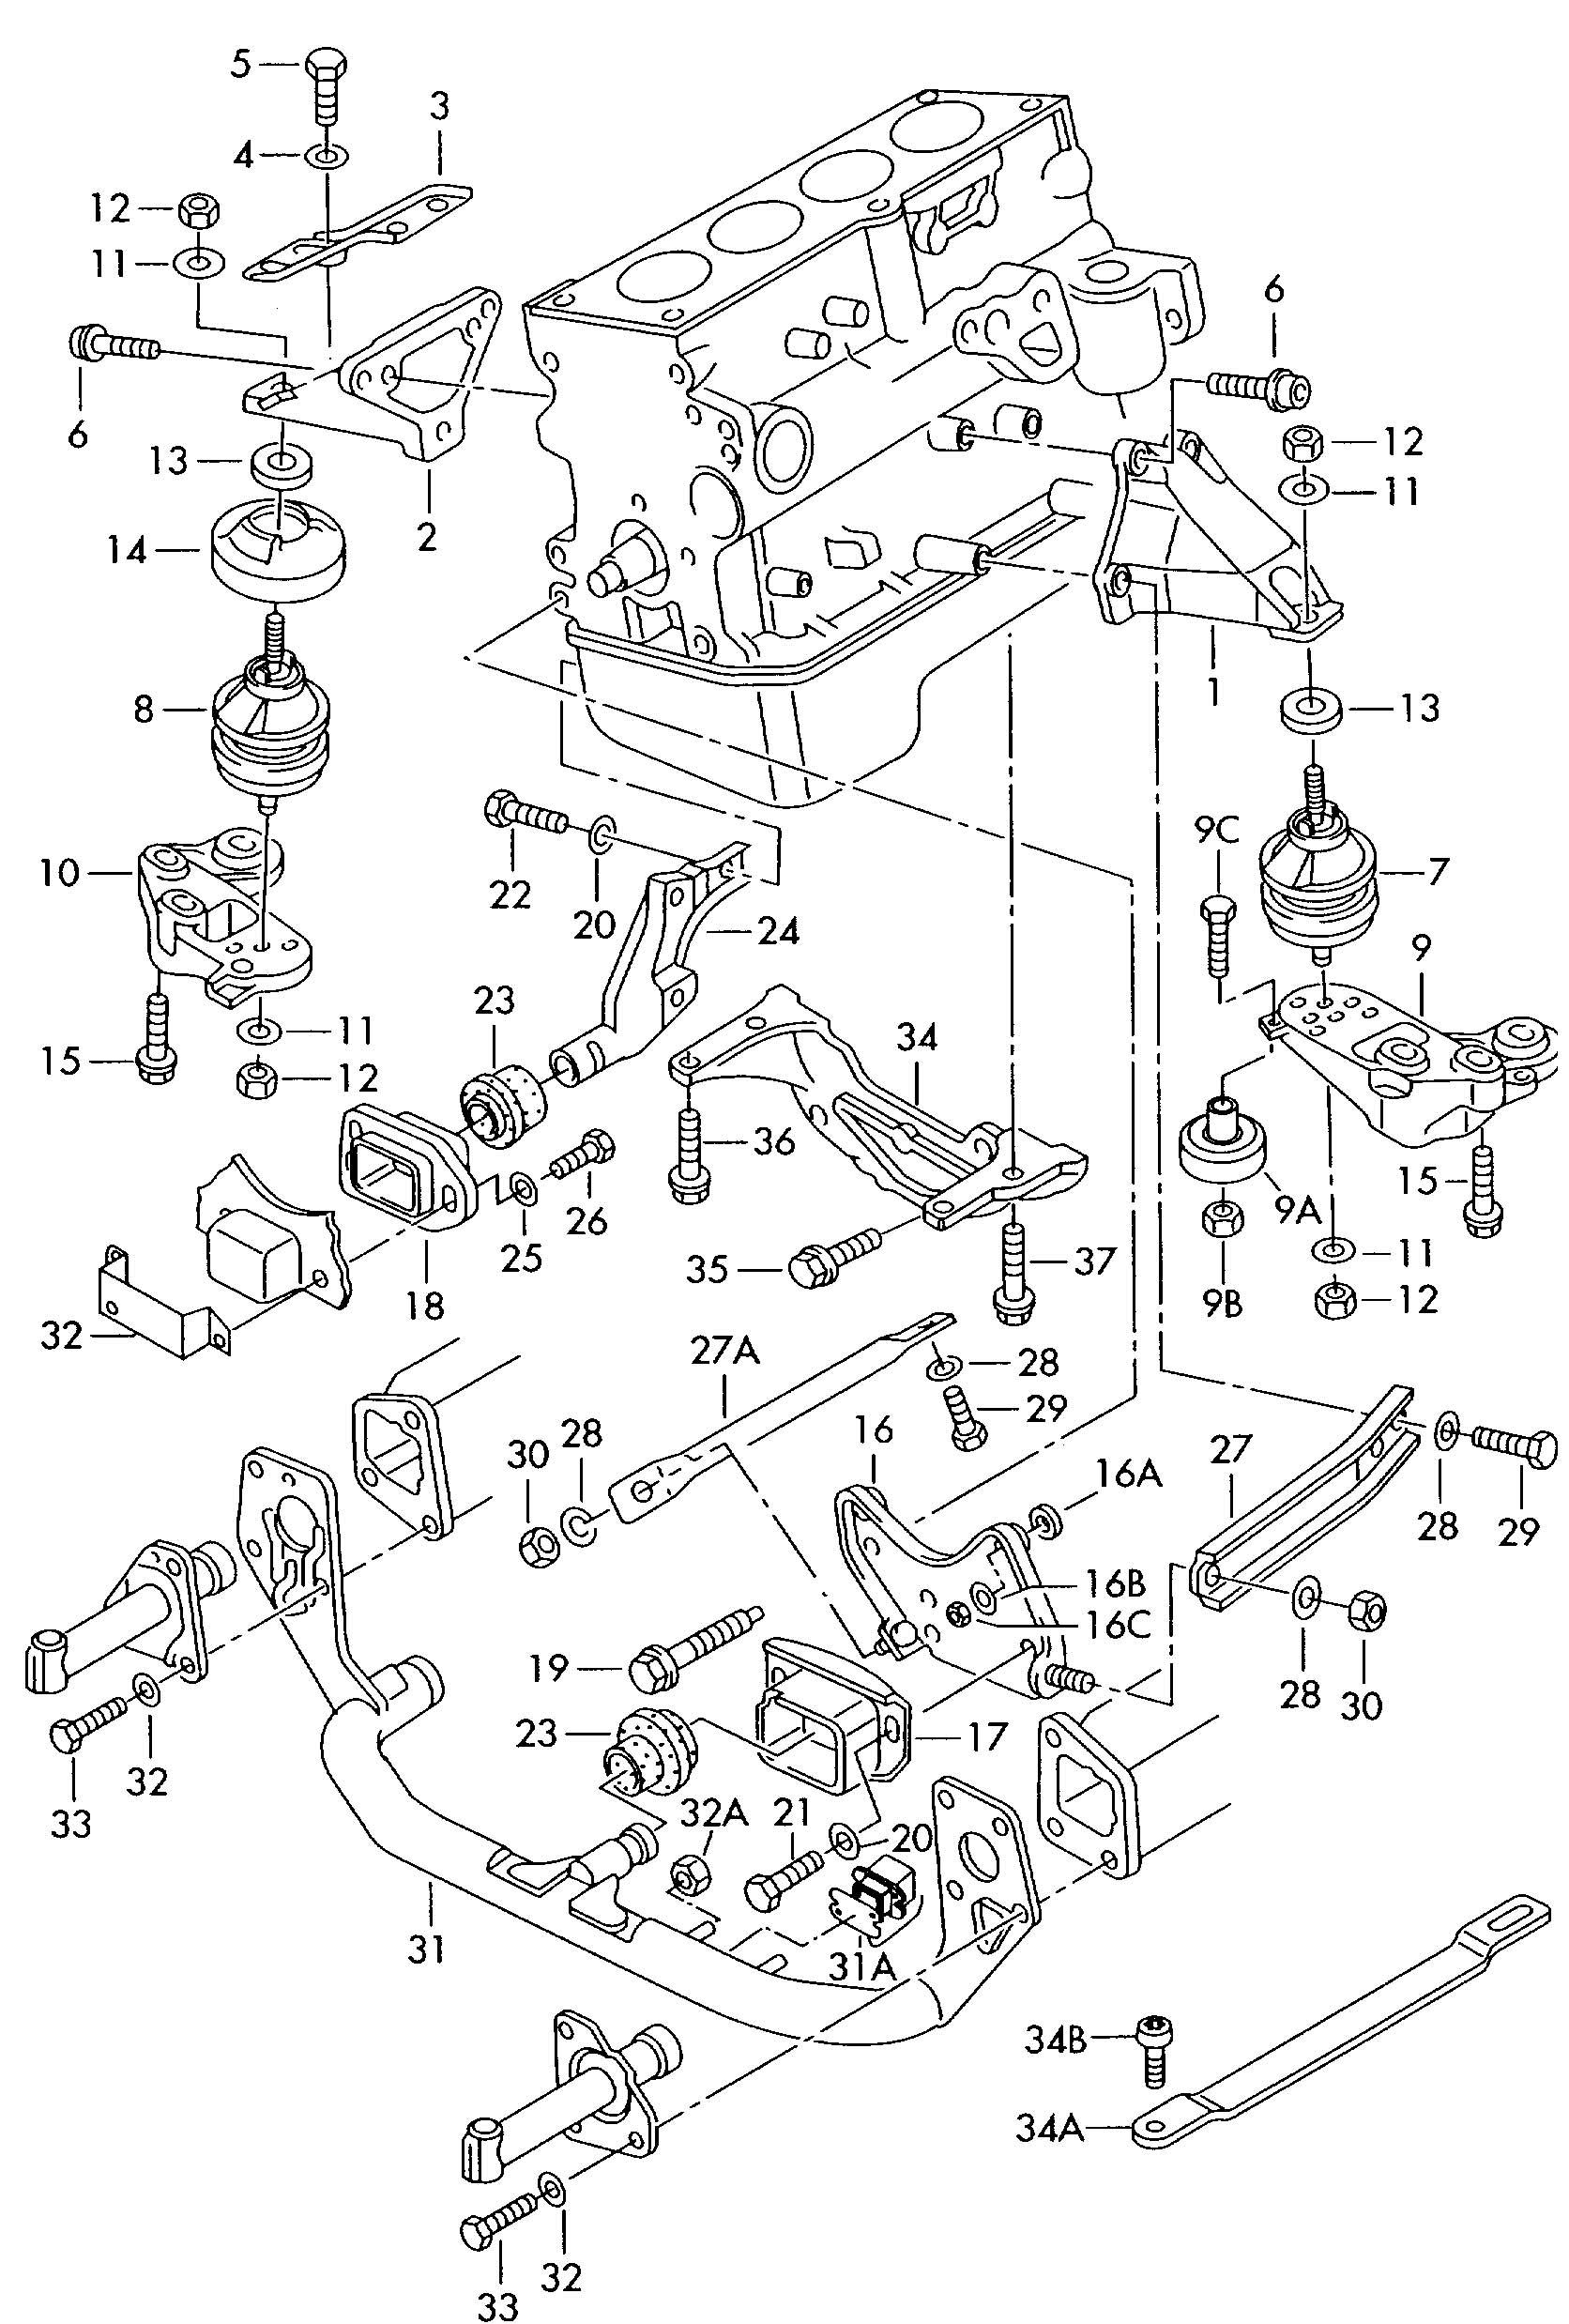 Showassembly on volkswagen eos parts diagram